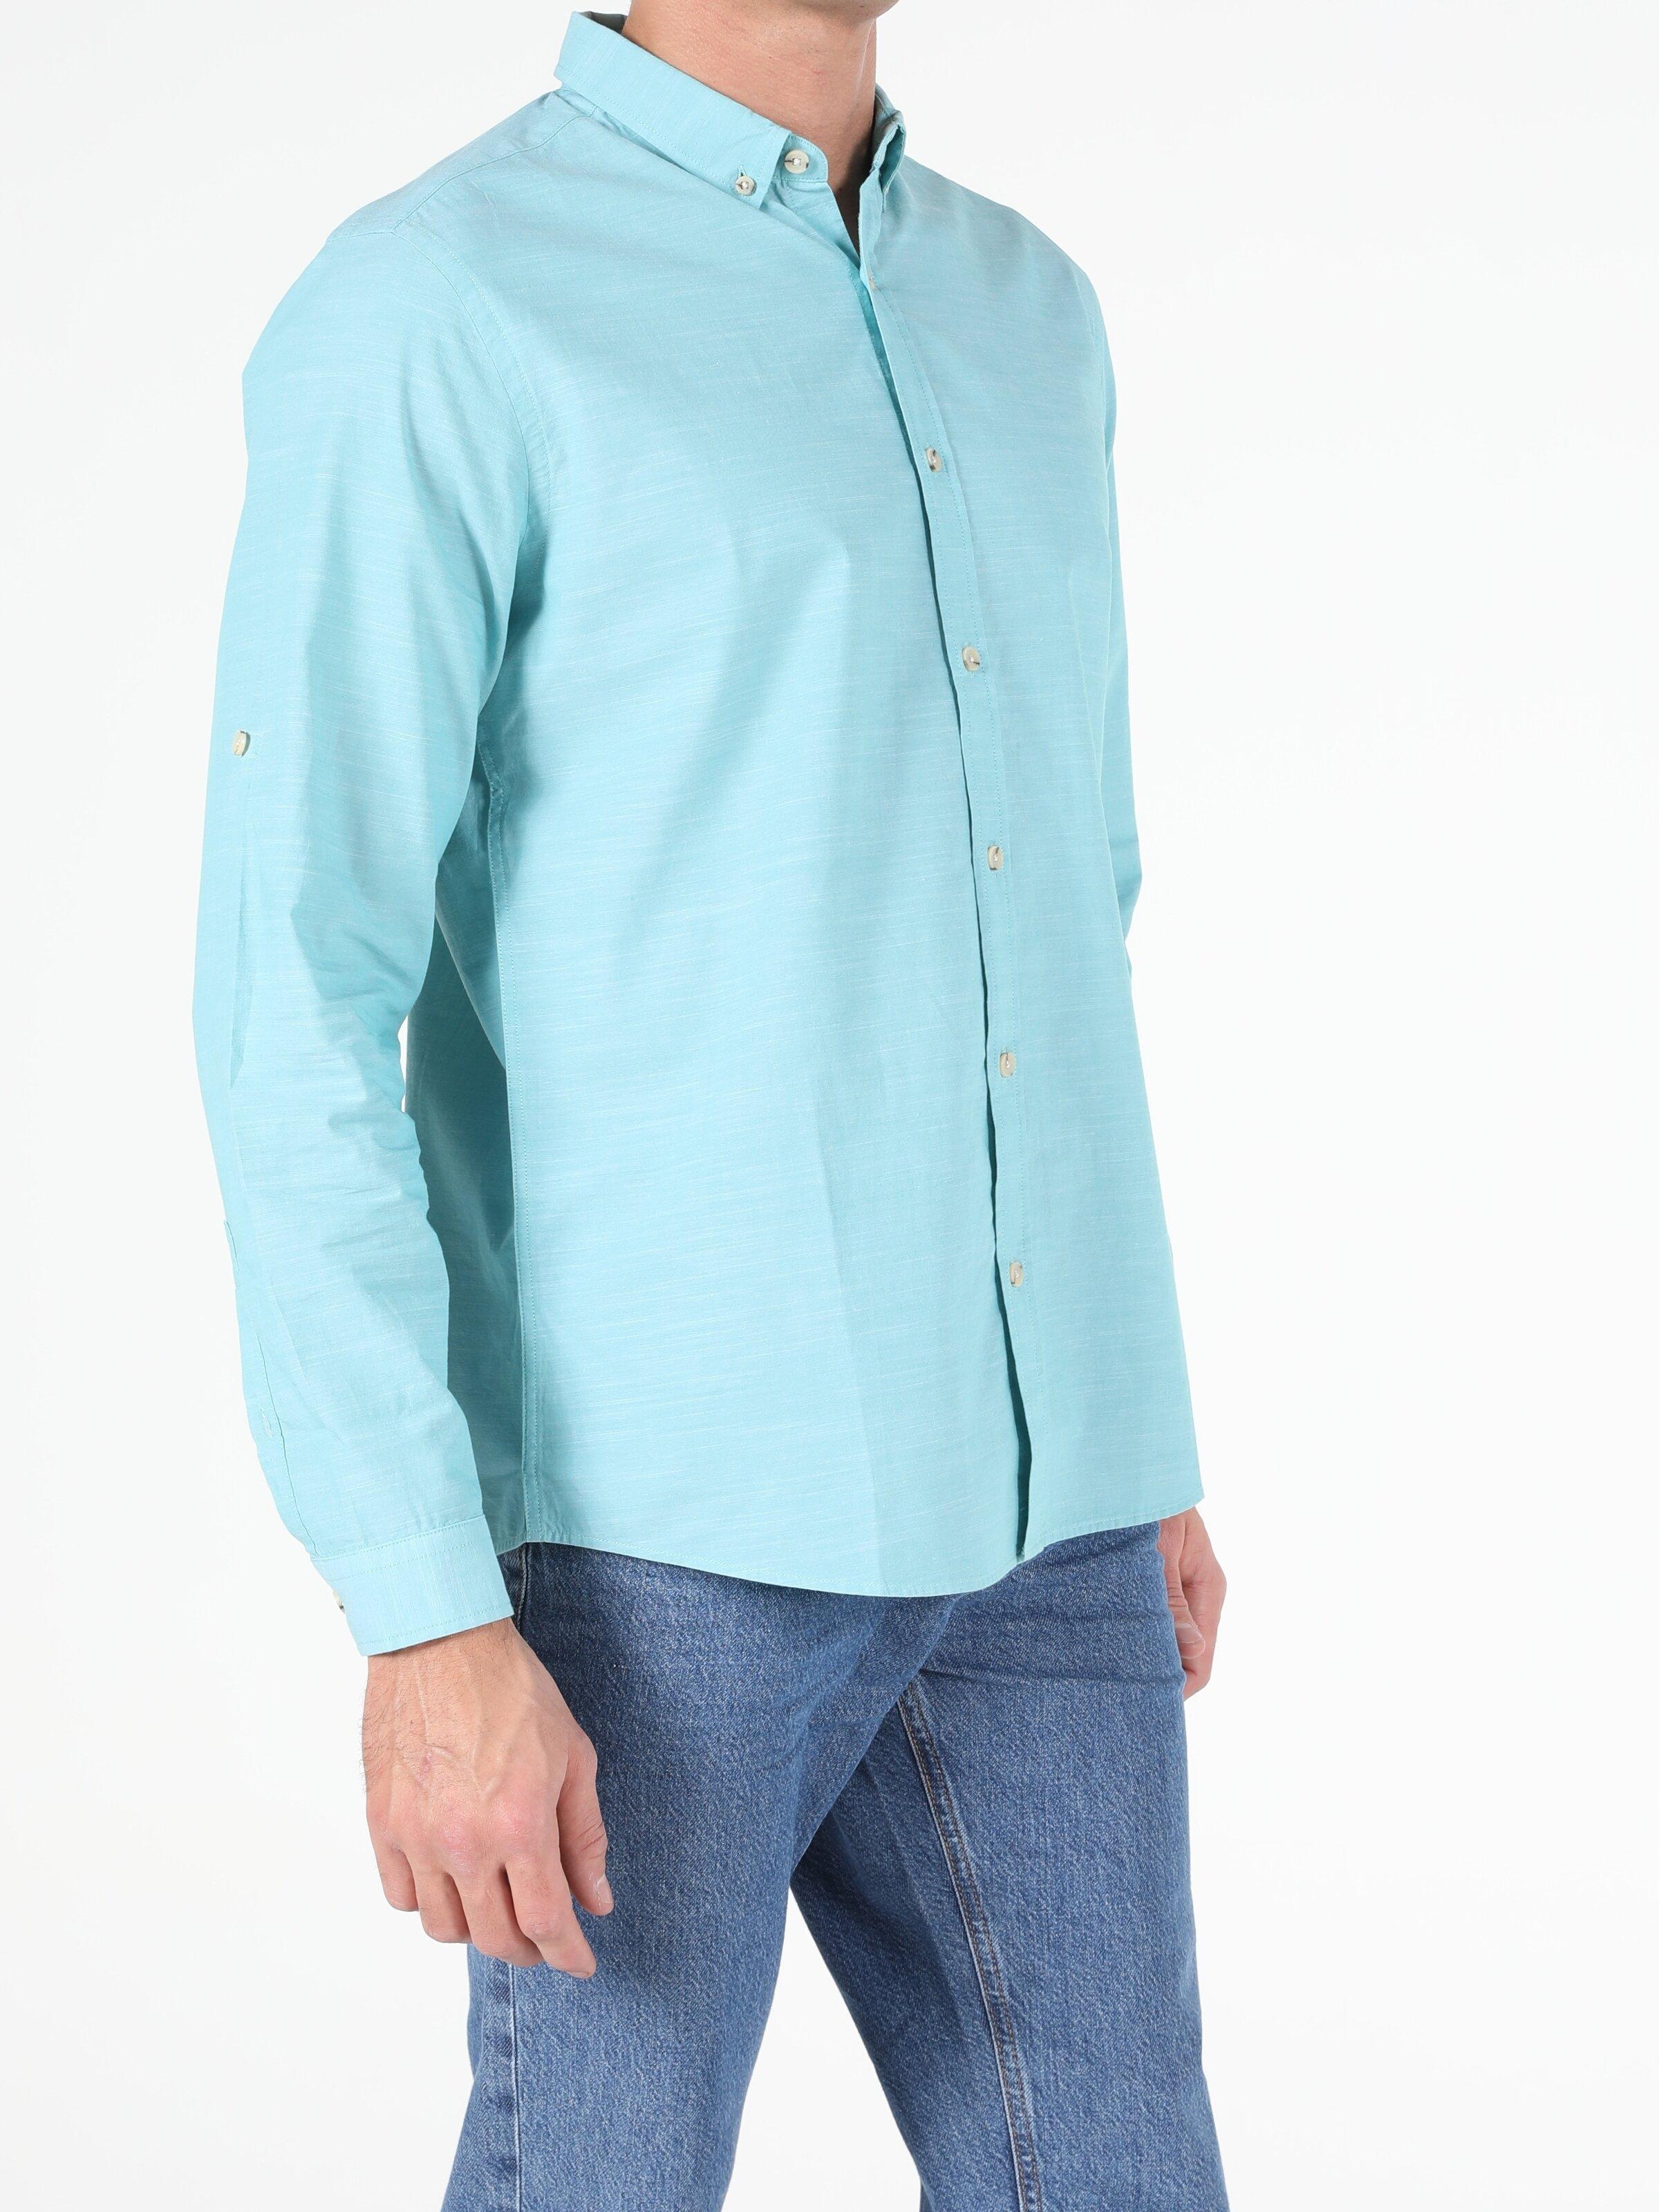 Regular Fit Shirt Neck Erkek Mint Yeşili Uzun Kol Gömlek